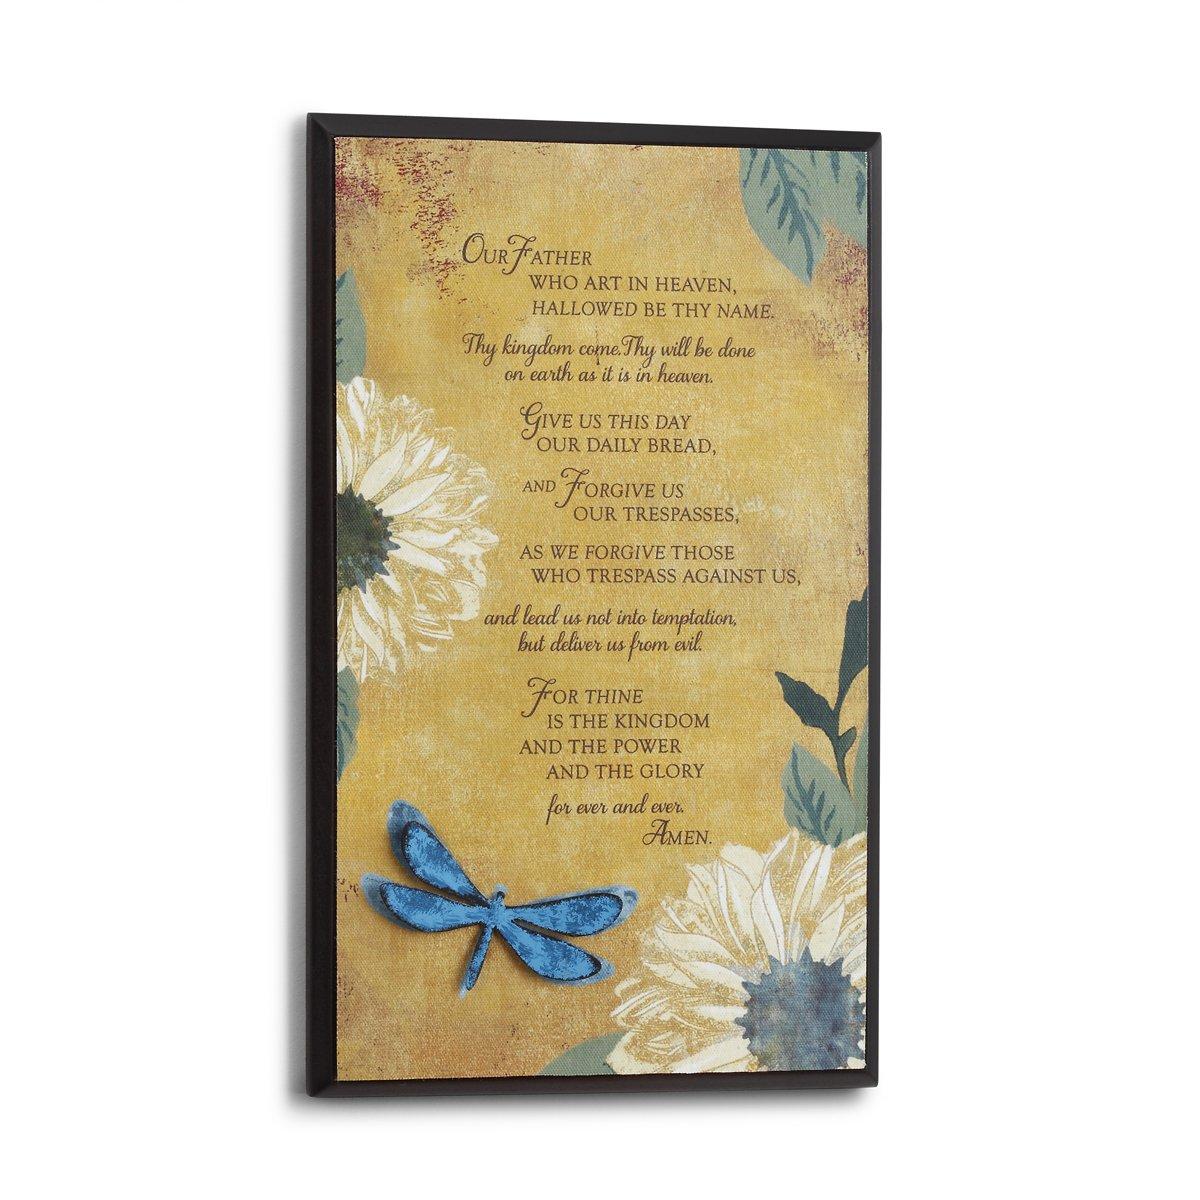 Amazon.com: DEMDACO The Lord\'s Prayer Wood Plaque: Home & Kitchen